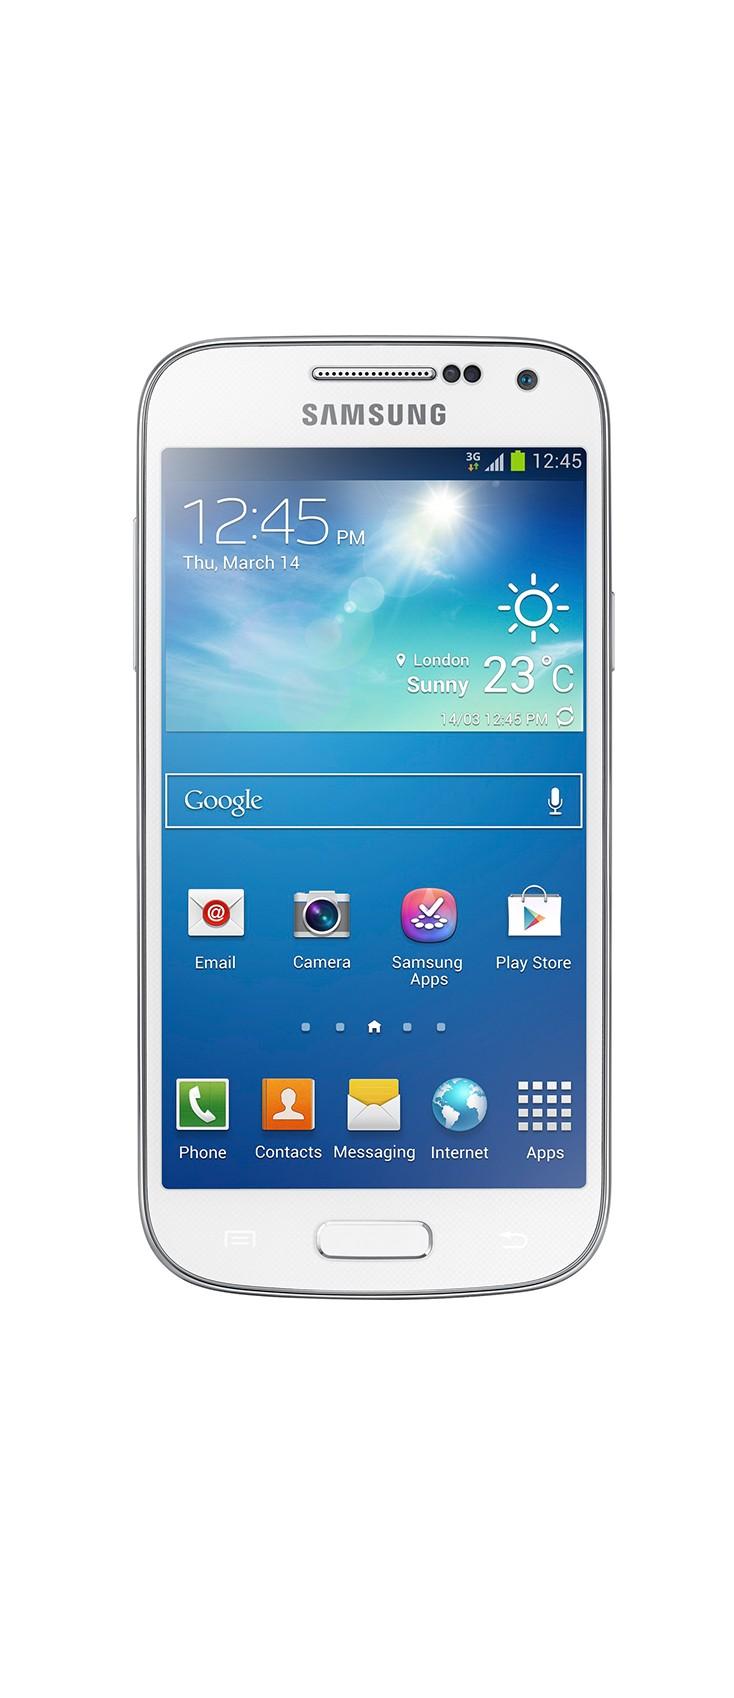 Samsung Galaxy S4 Mini Foto Tudocelular Com